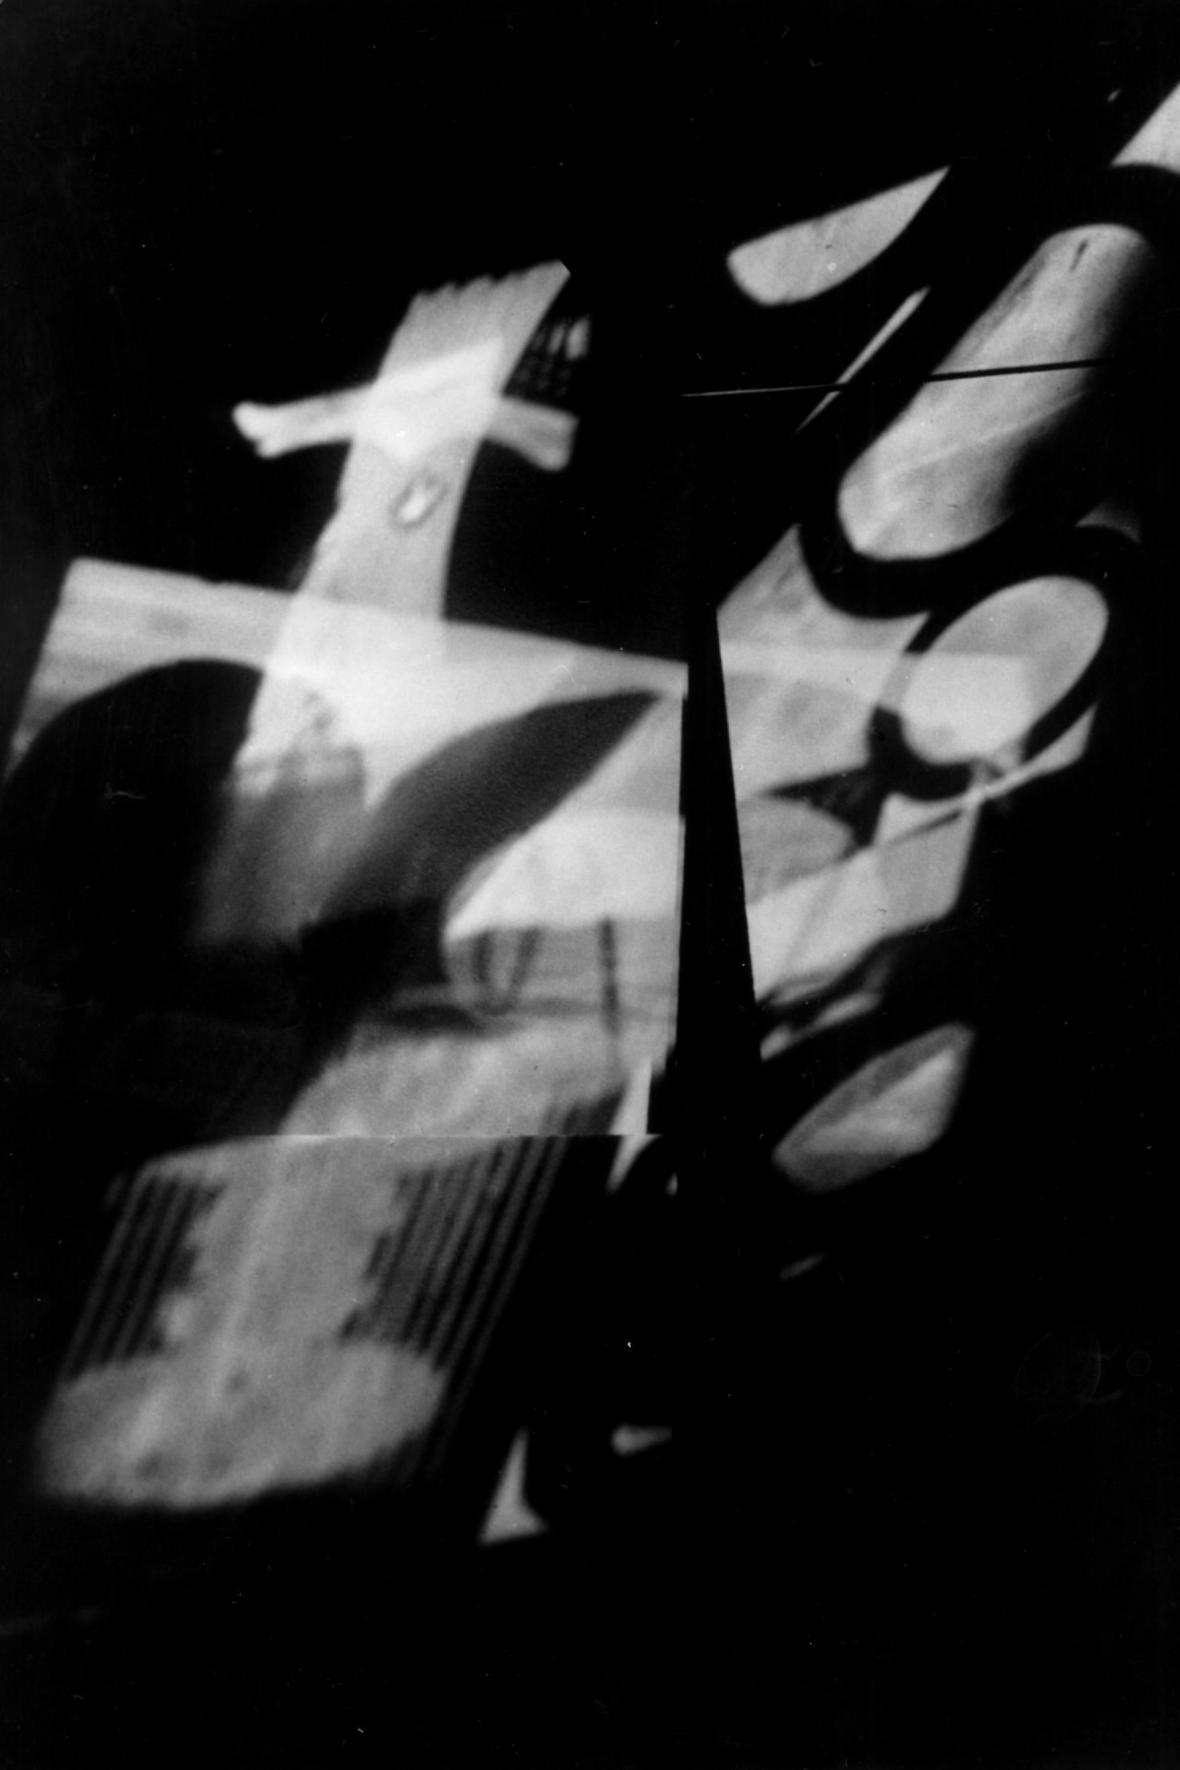 Jaromír Funke - Abstraktní foto (1928-29)